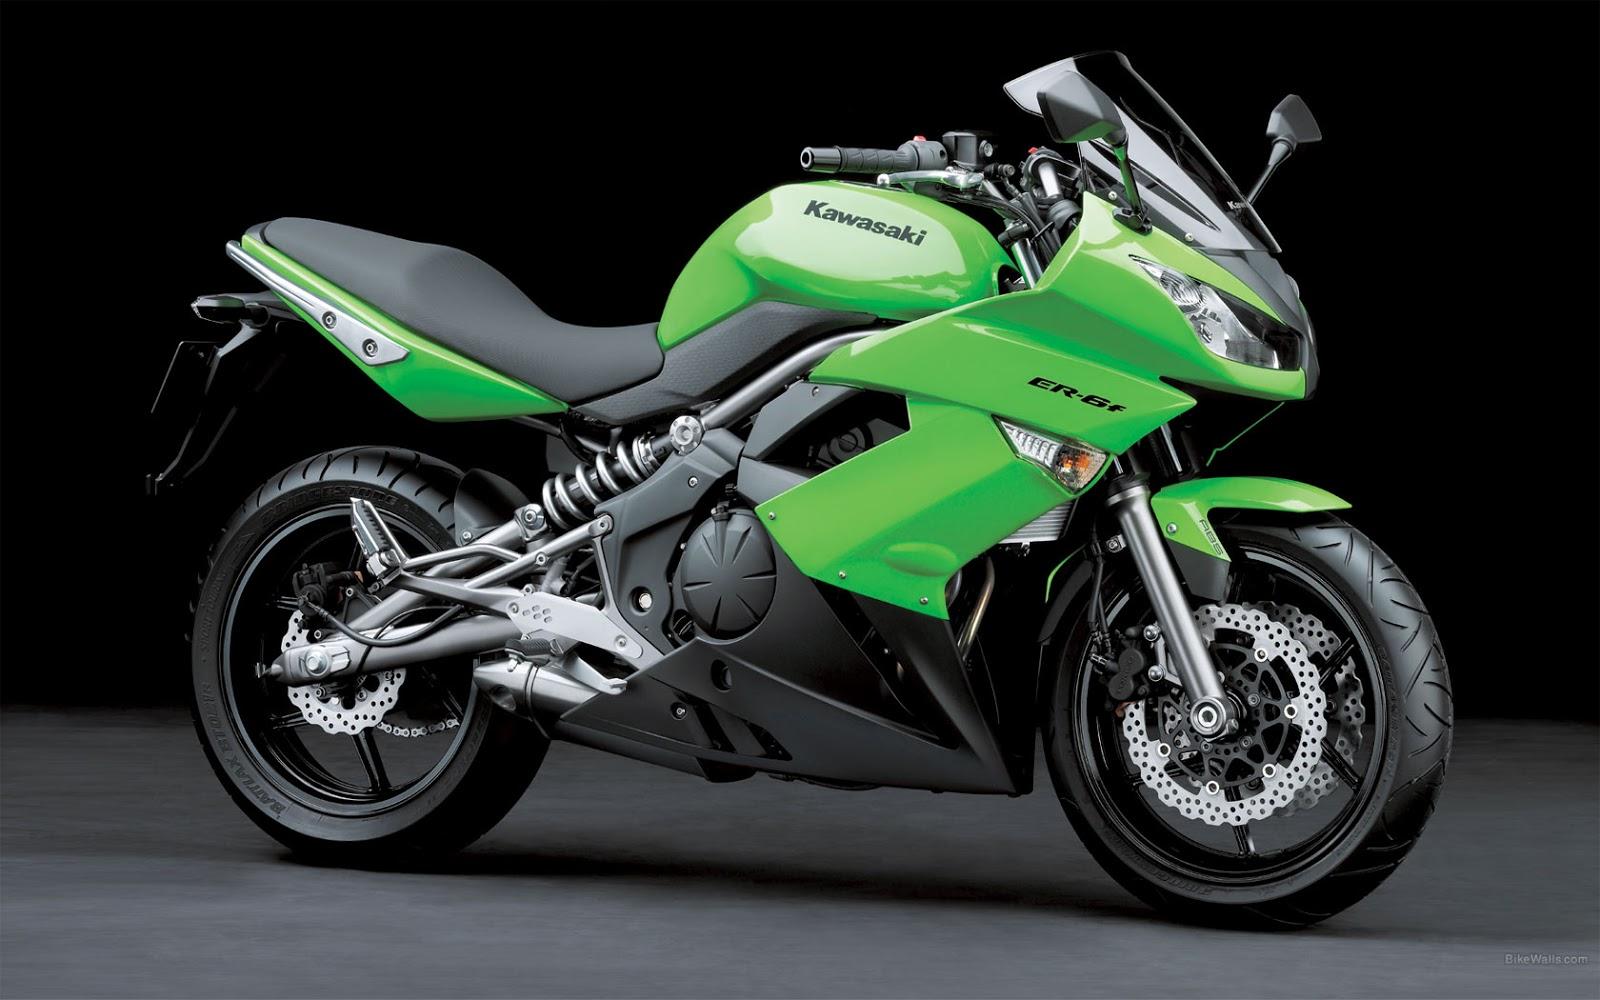 Kawasaki Motocycle Manuals Resource Kawasaki Ninja 650r Er 6f Abs